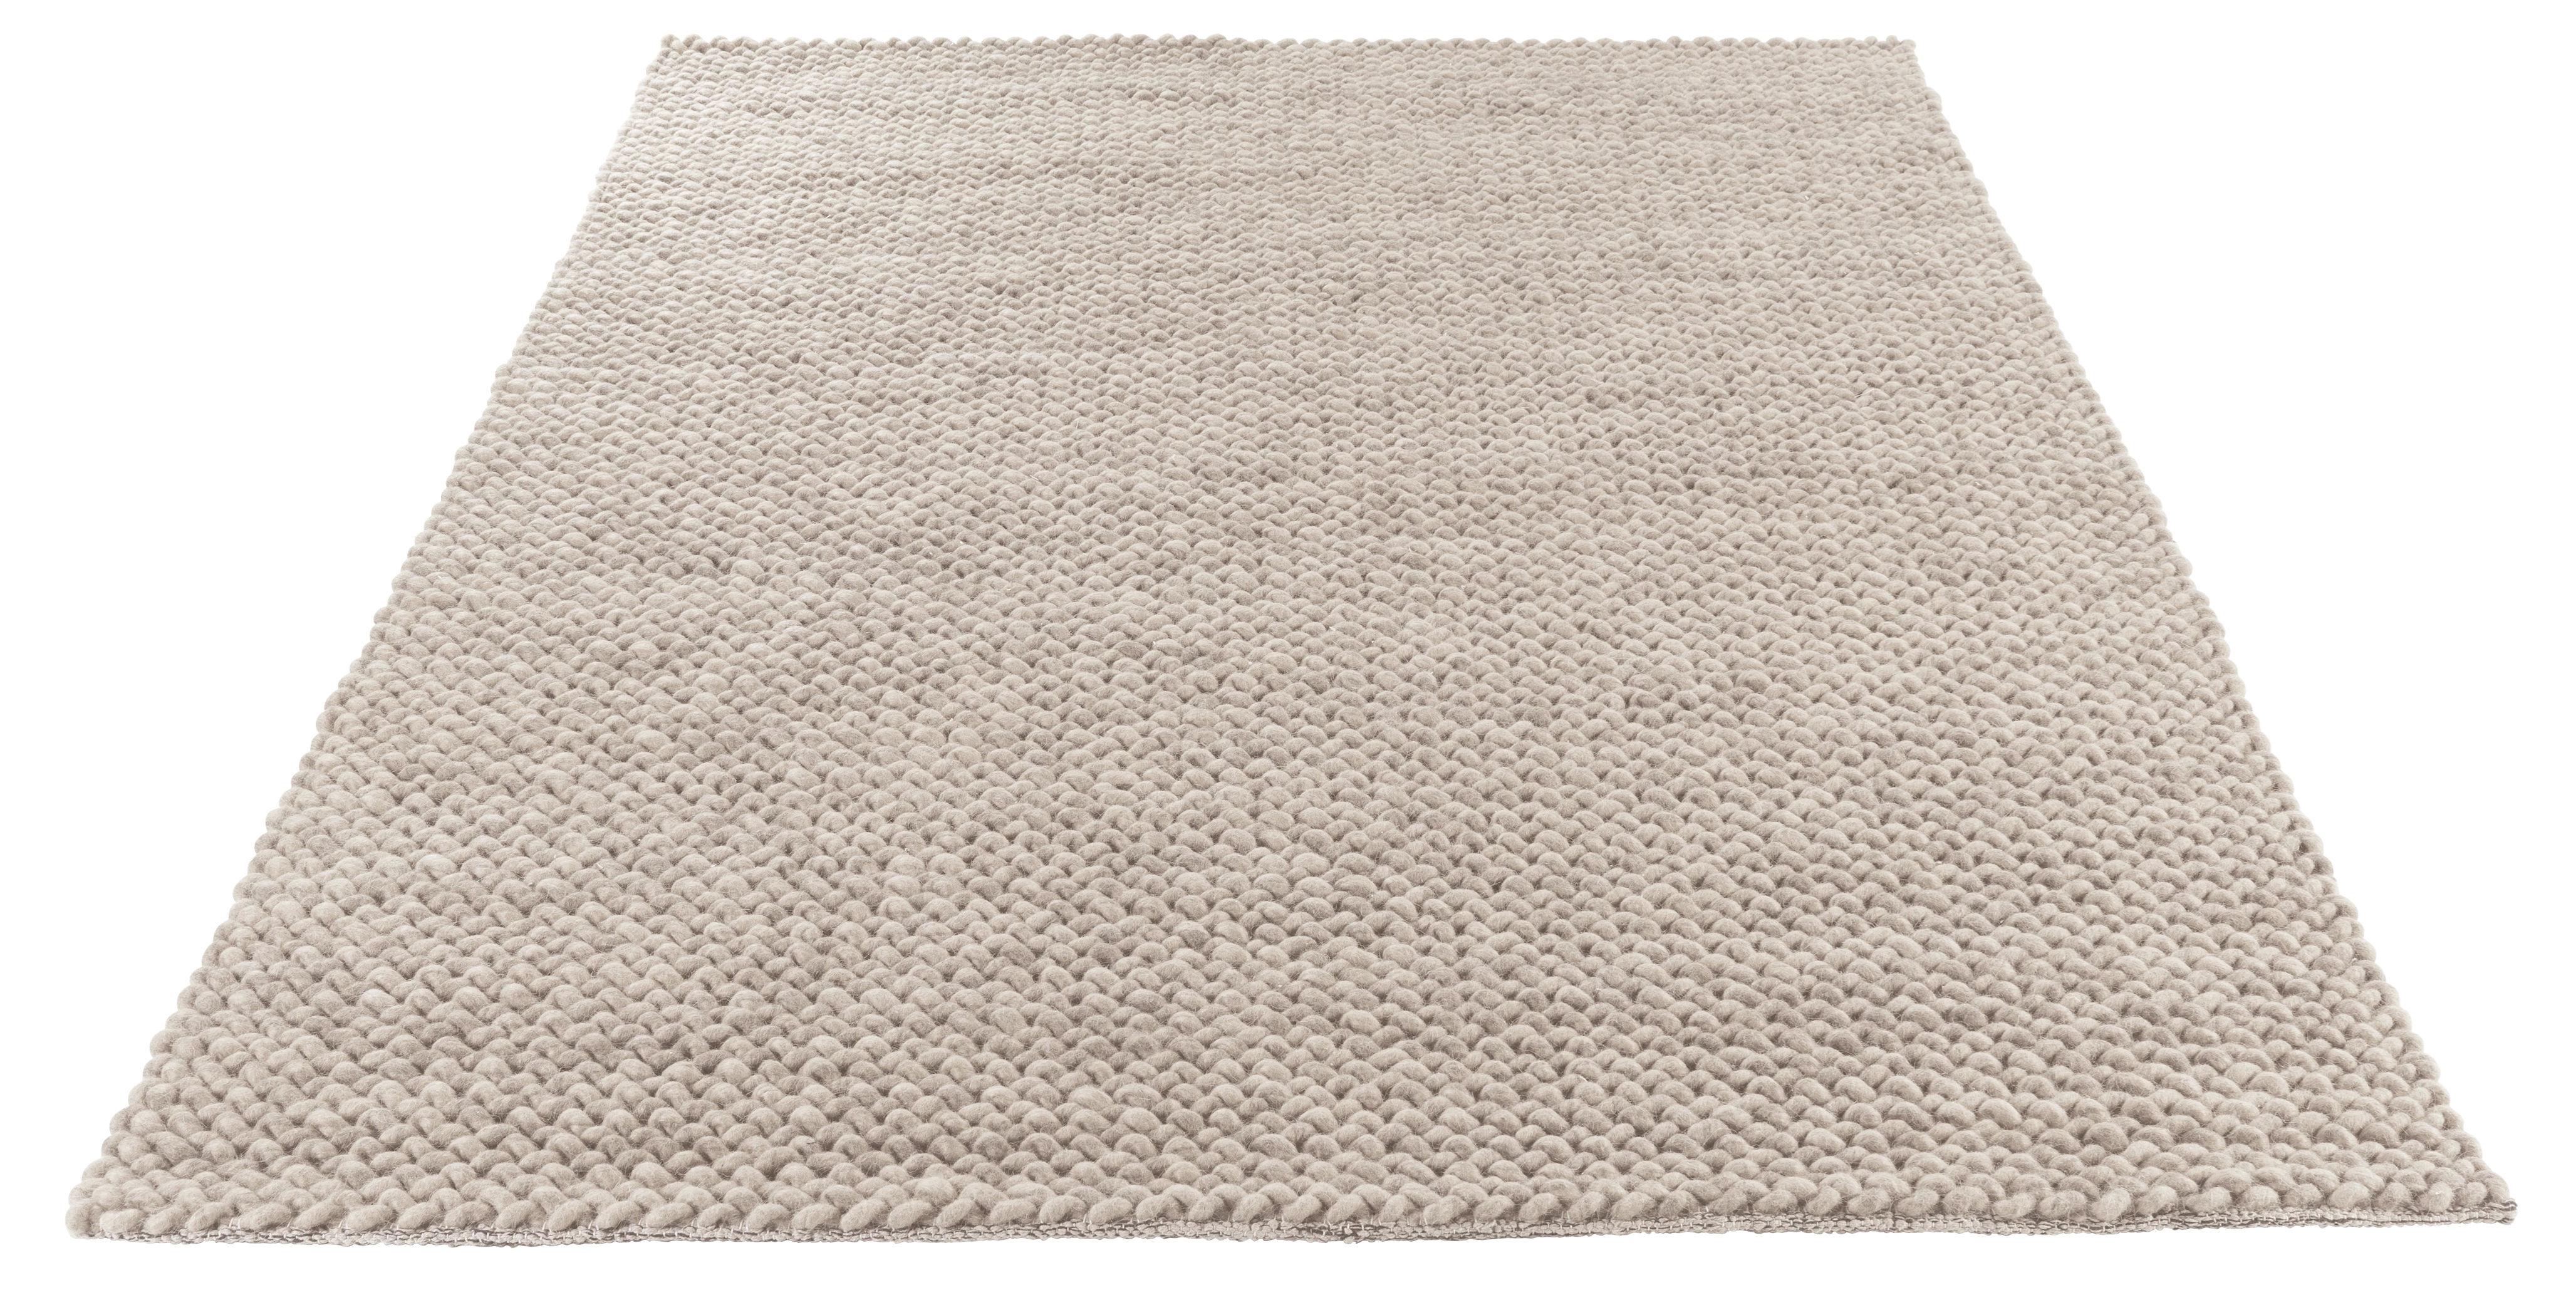 Decoration - Rugs - Loop Rug - 140 x 200 cm by Bolia - Mix grey - 100% wool